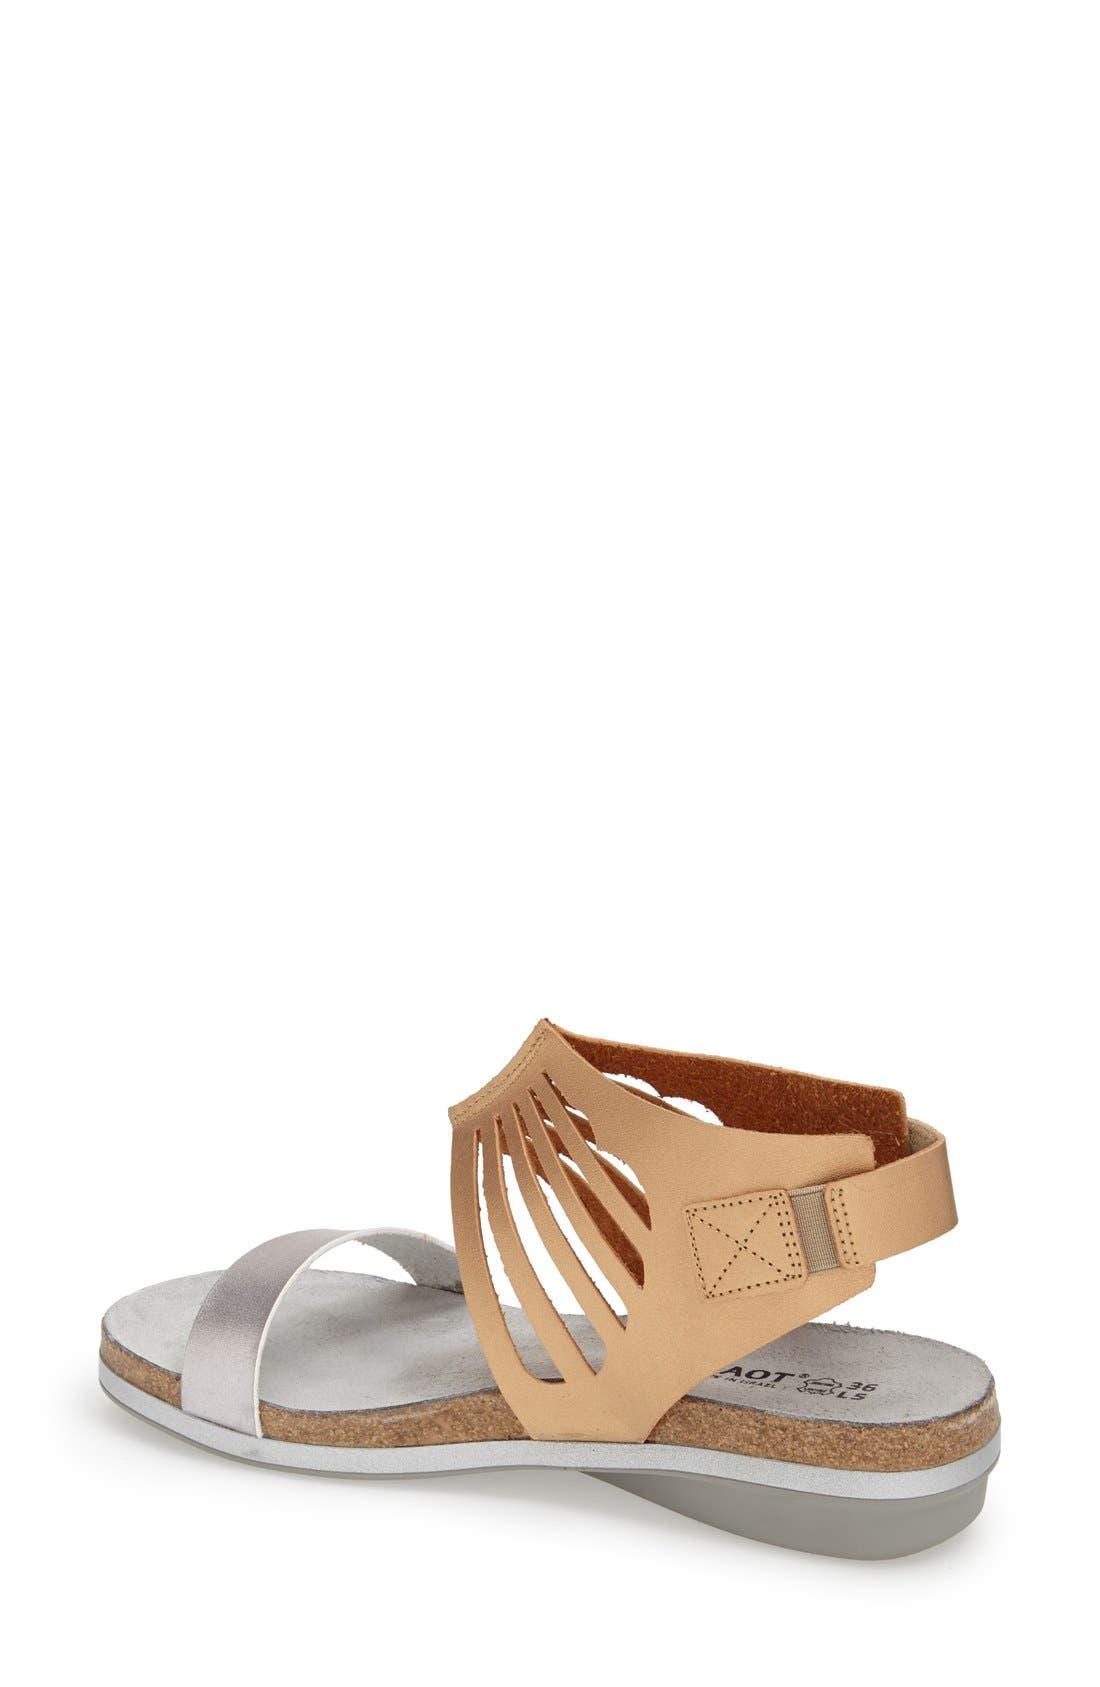 Alternate Image 2  - Naot 'Mint' Sandal (Women)